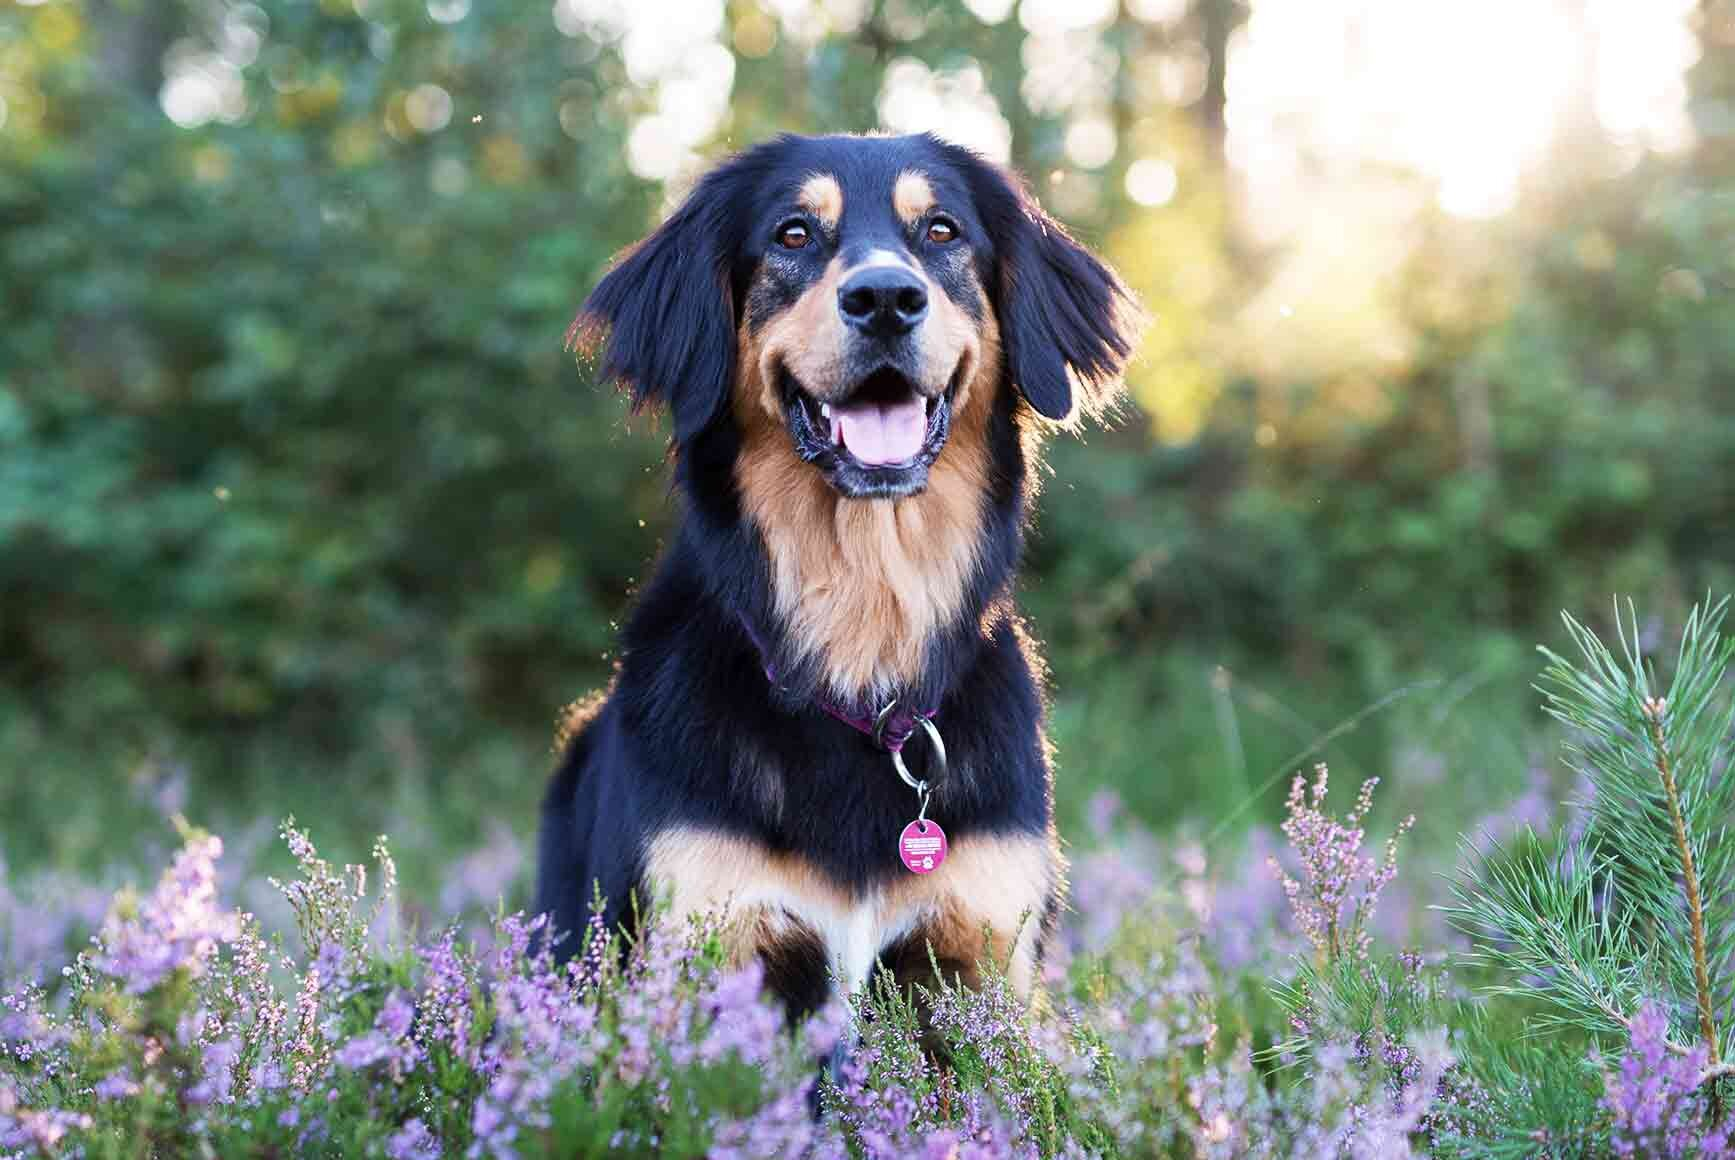 Beliebtesten Hundenamen